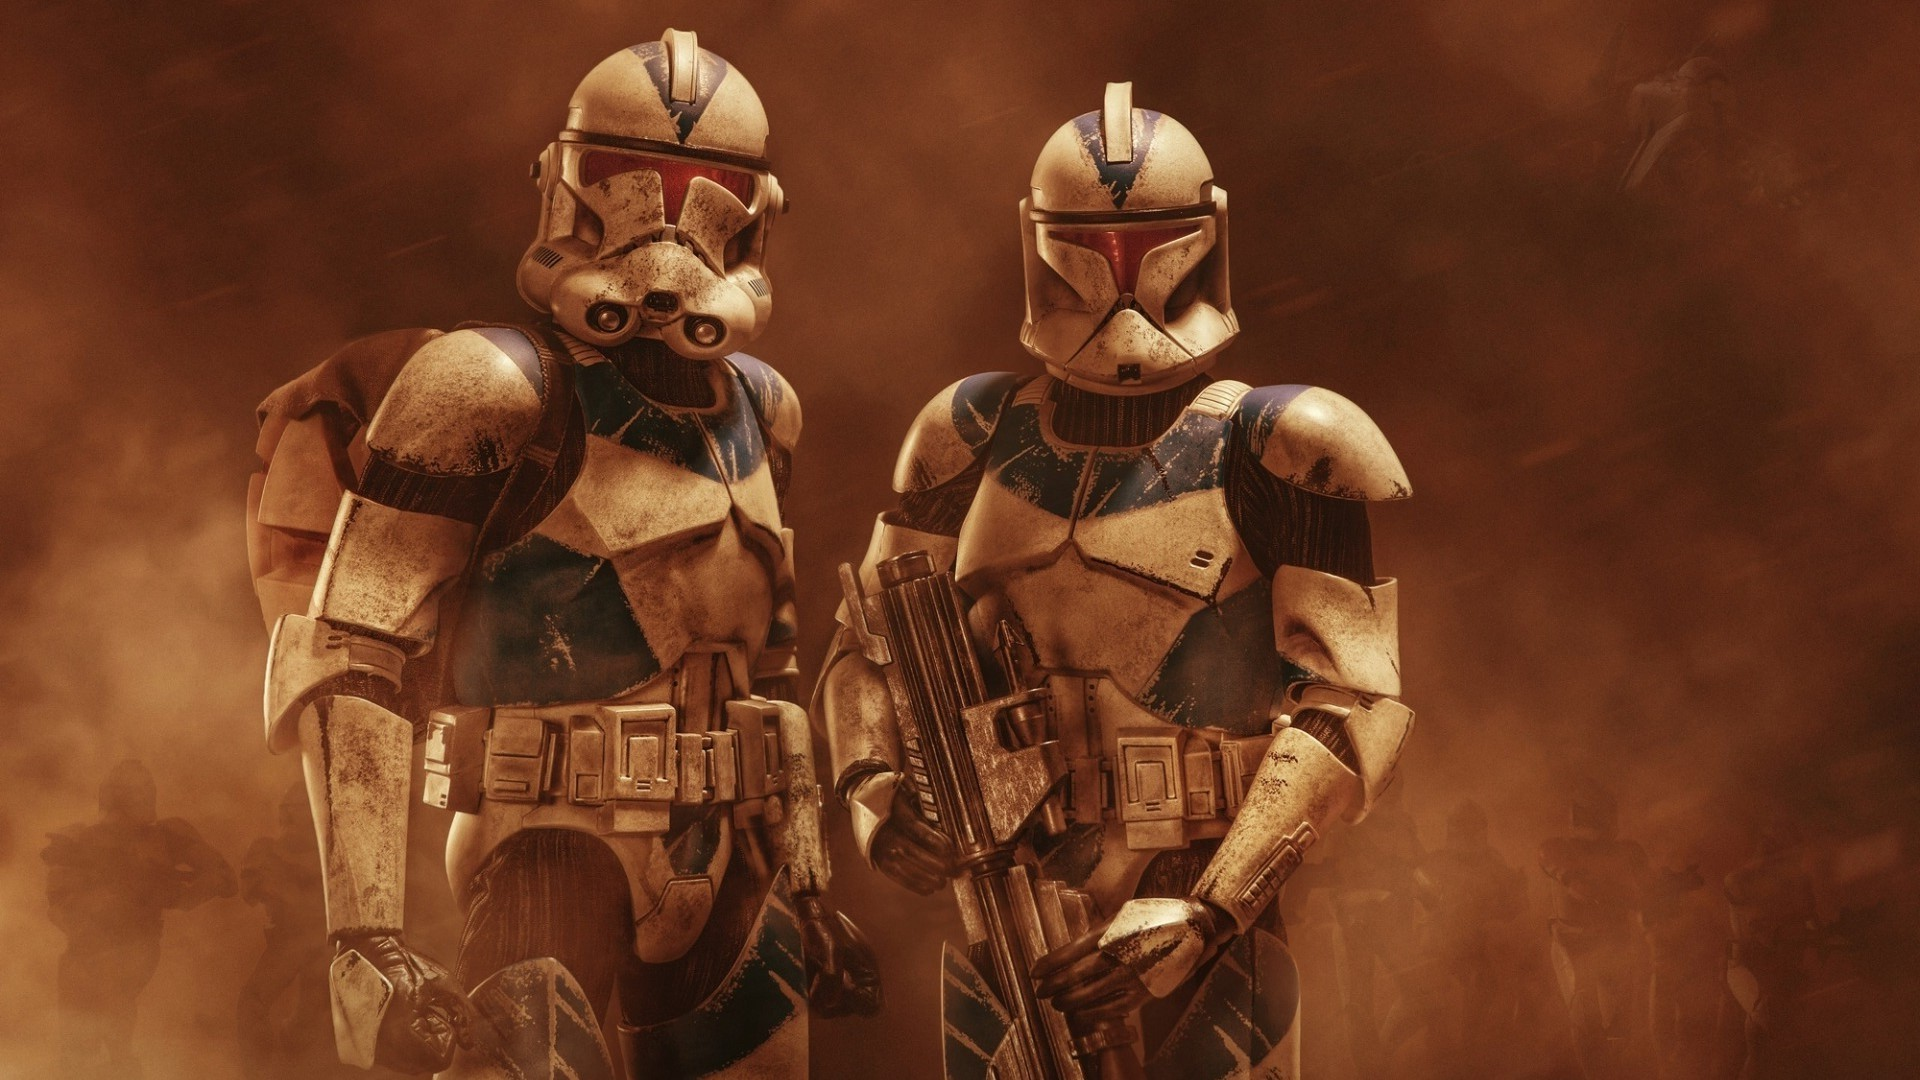 Clone Trooper iPhone Wallpaper 65+ images